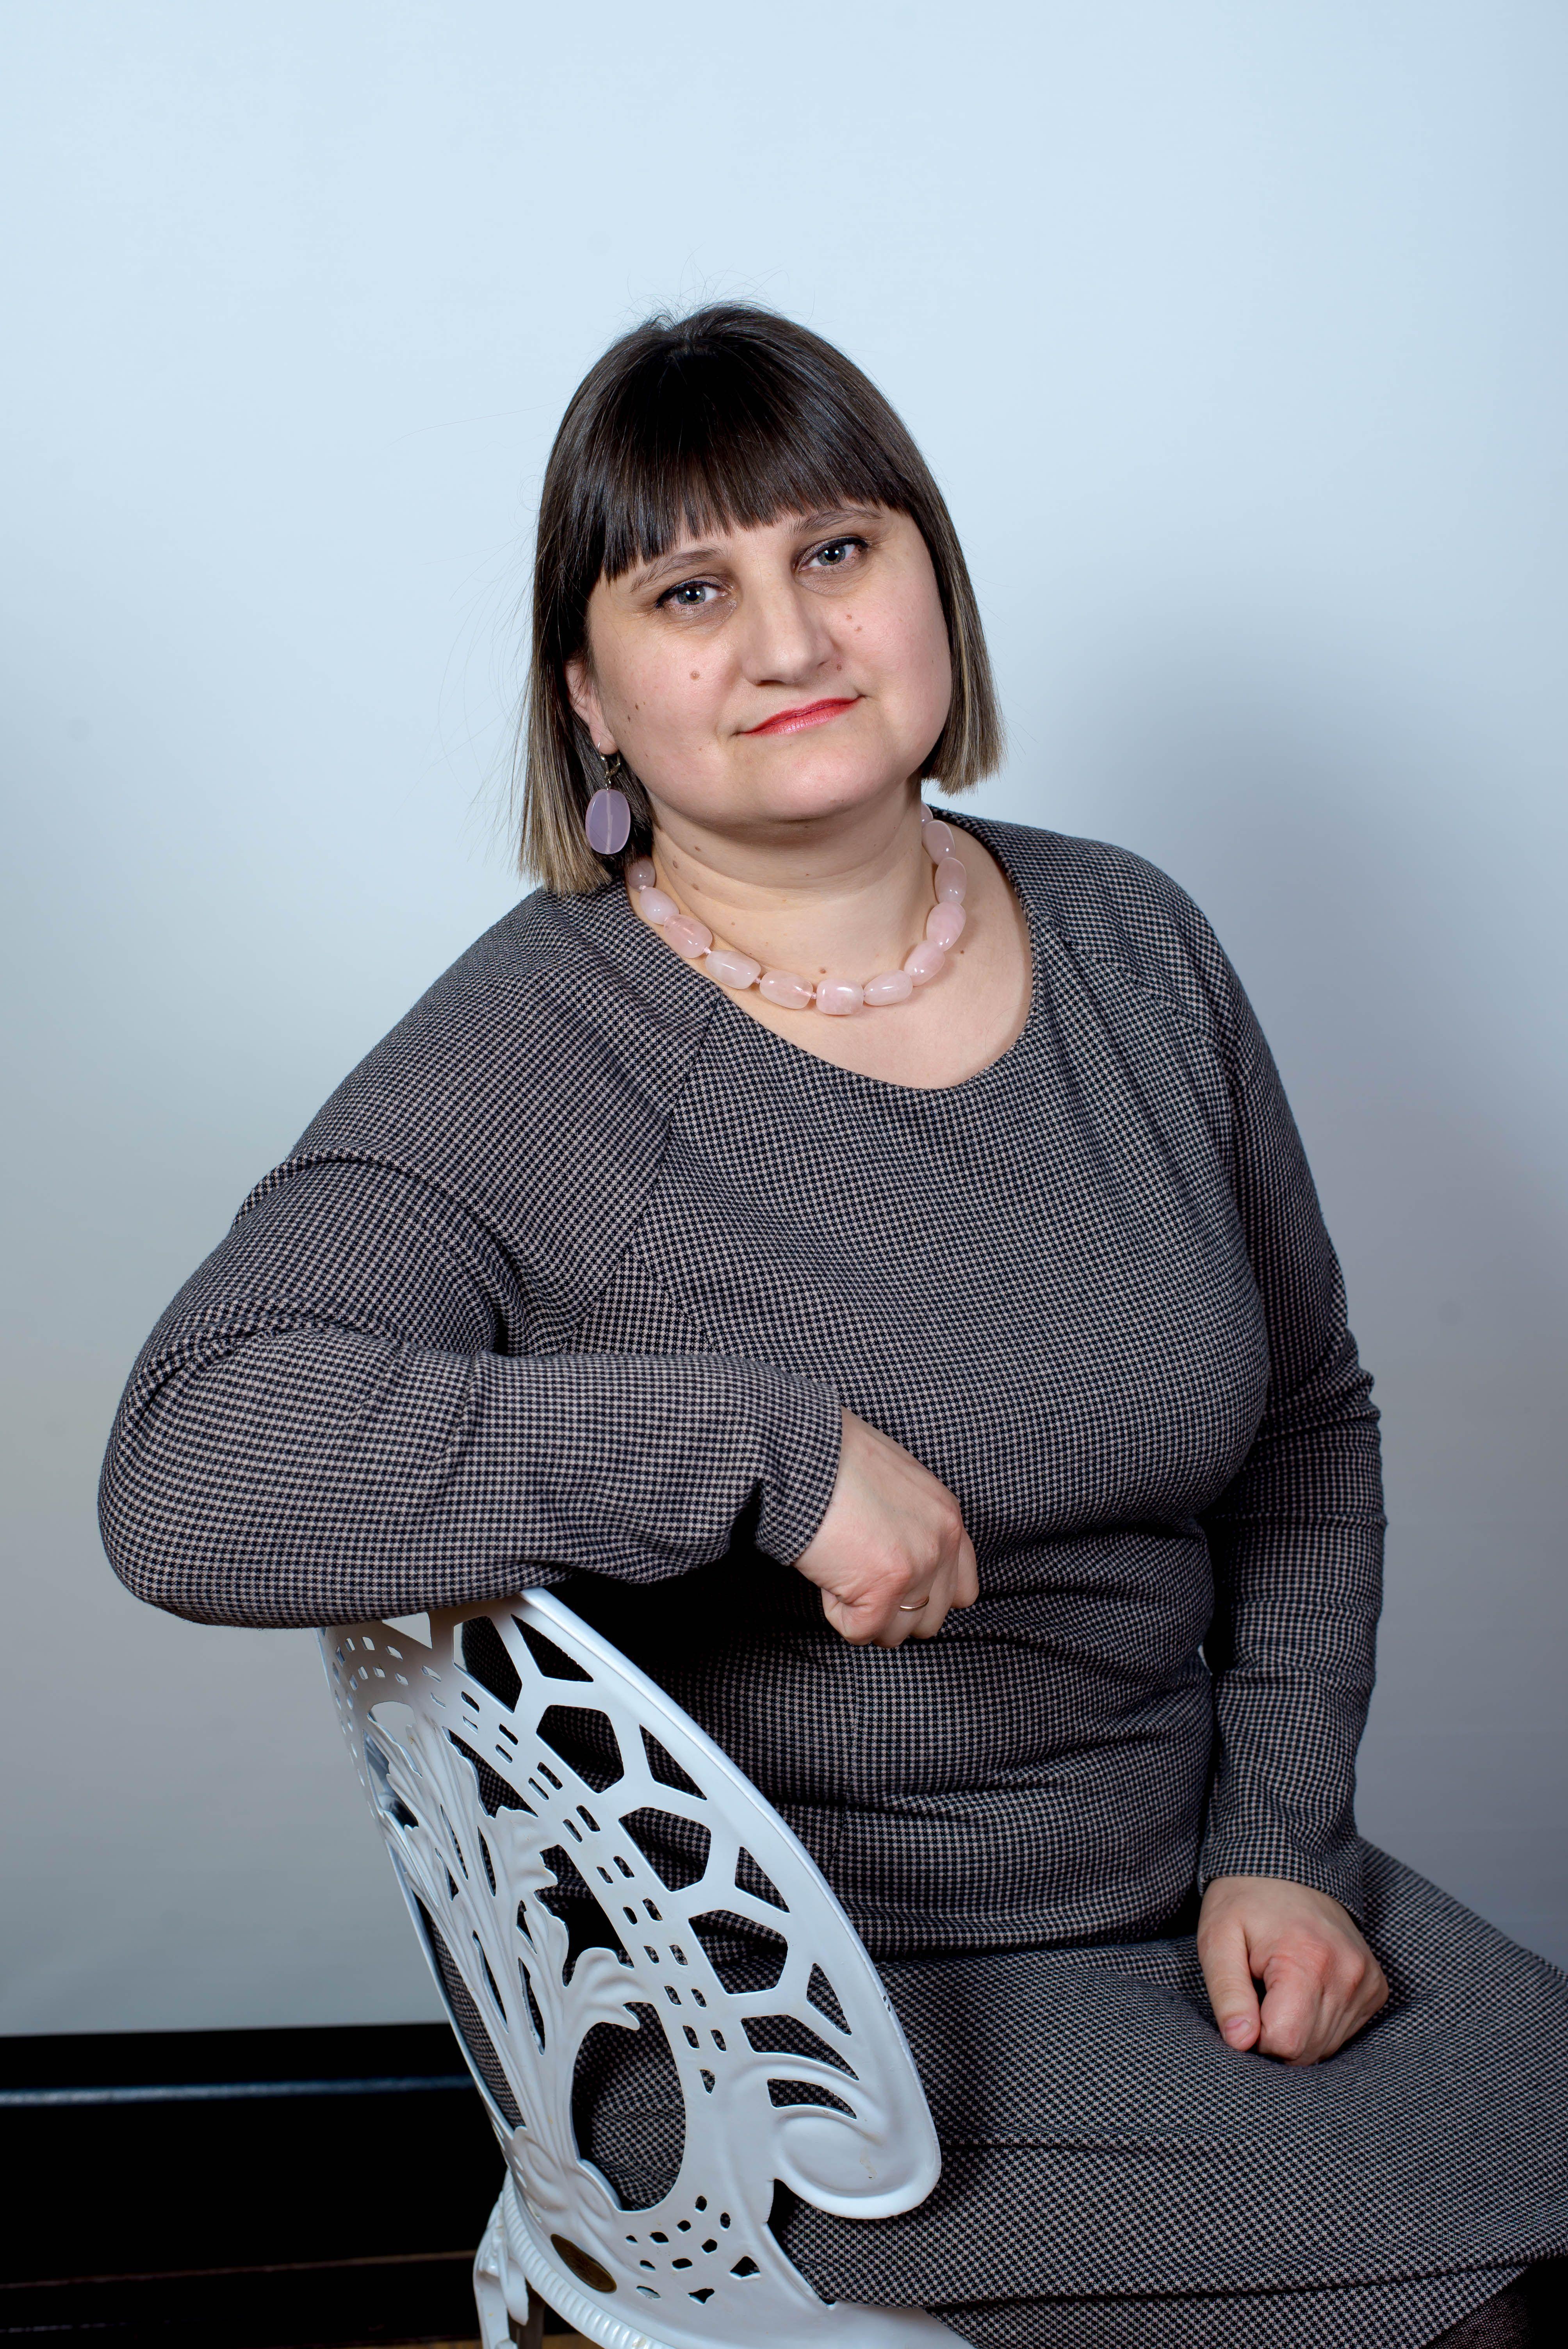 Козира Оксана Степанівна.Викладач по класу фортепіапно.Вища кат